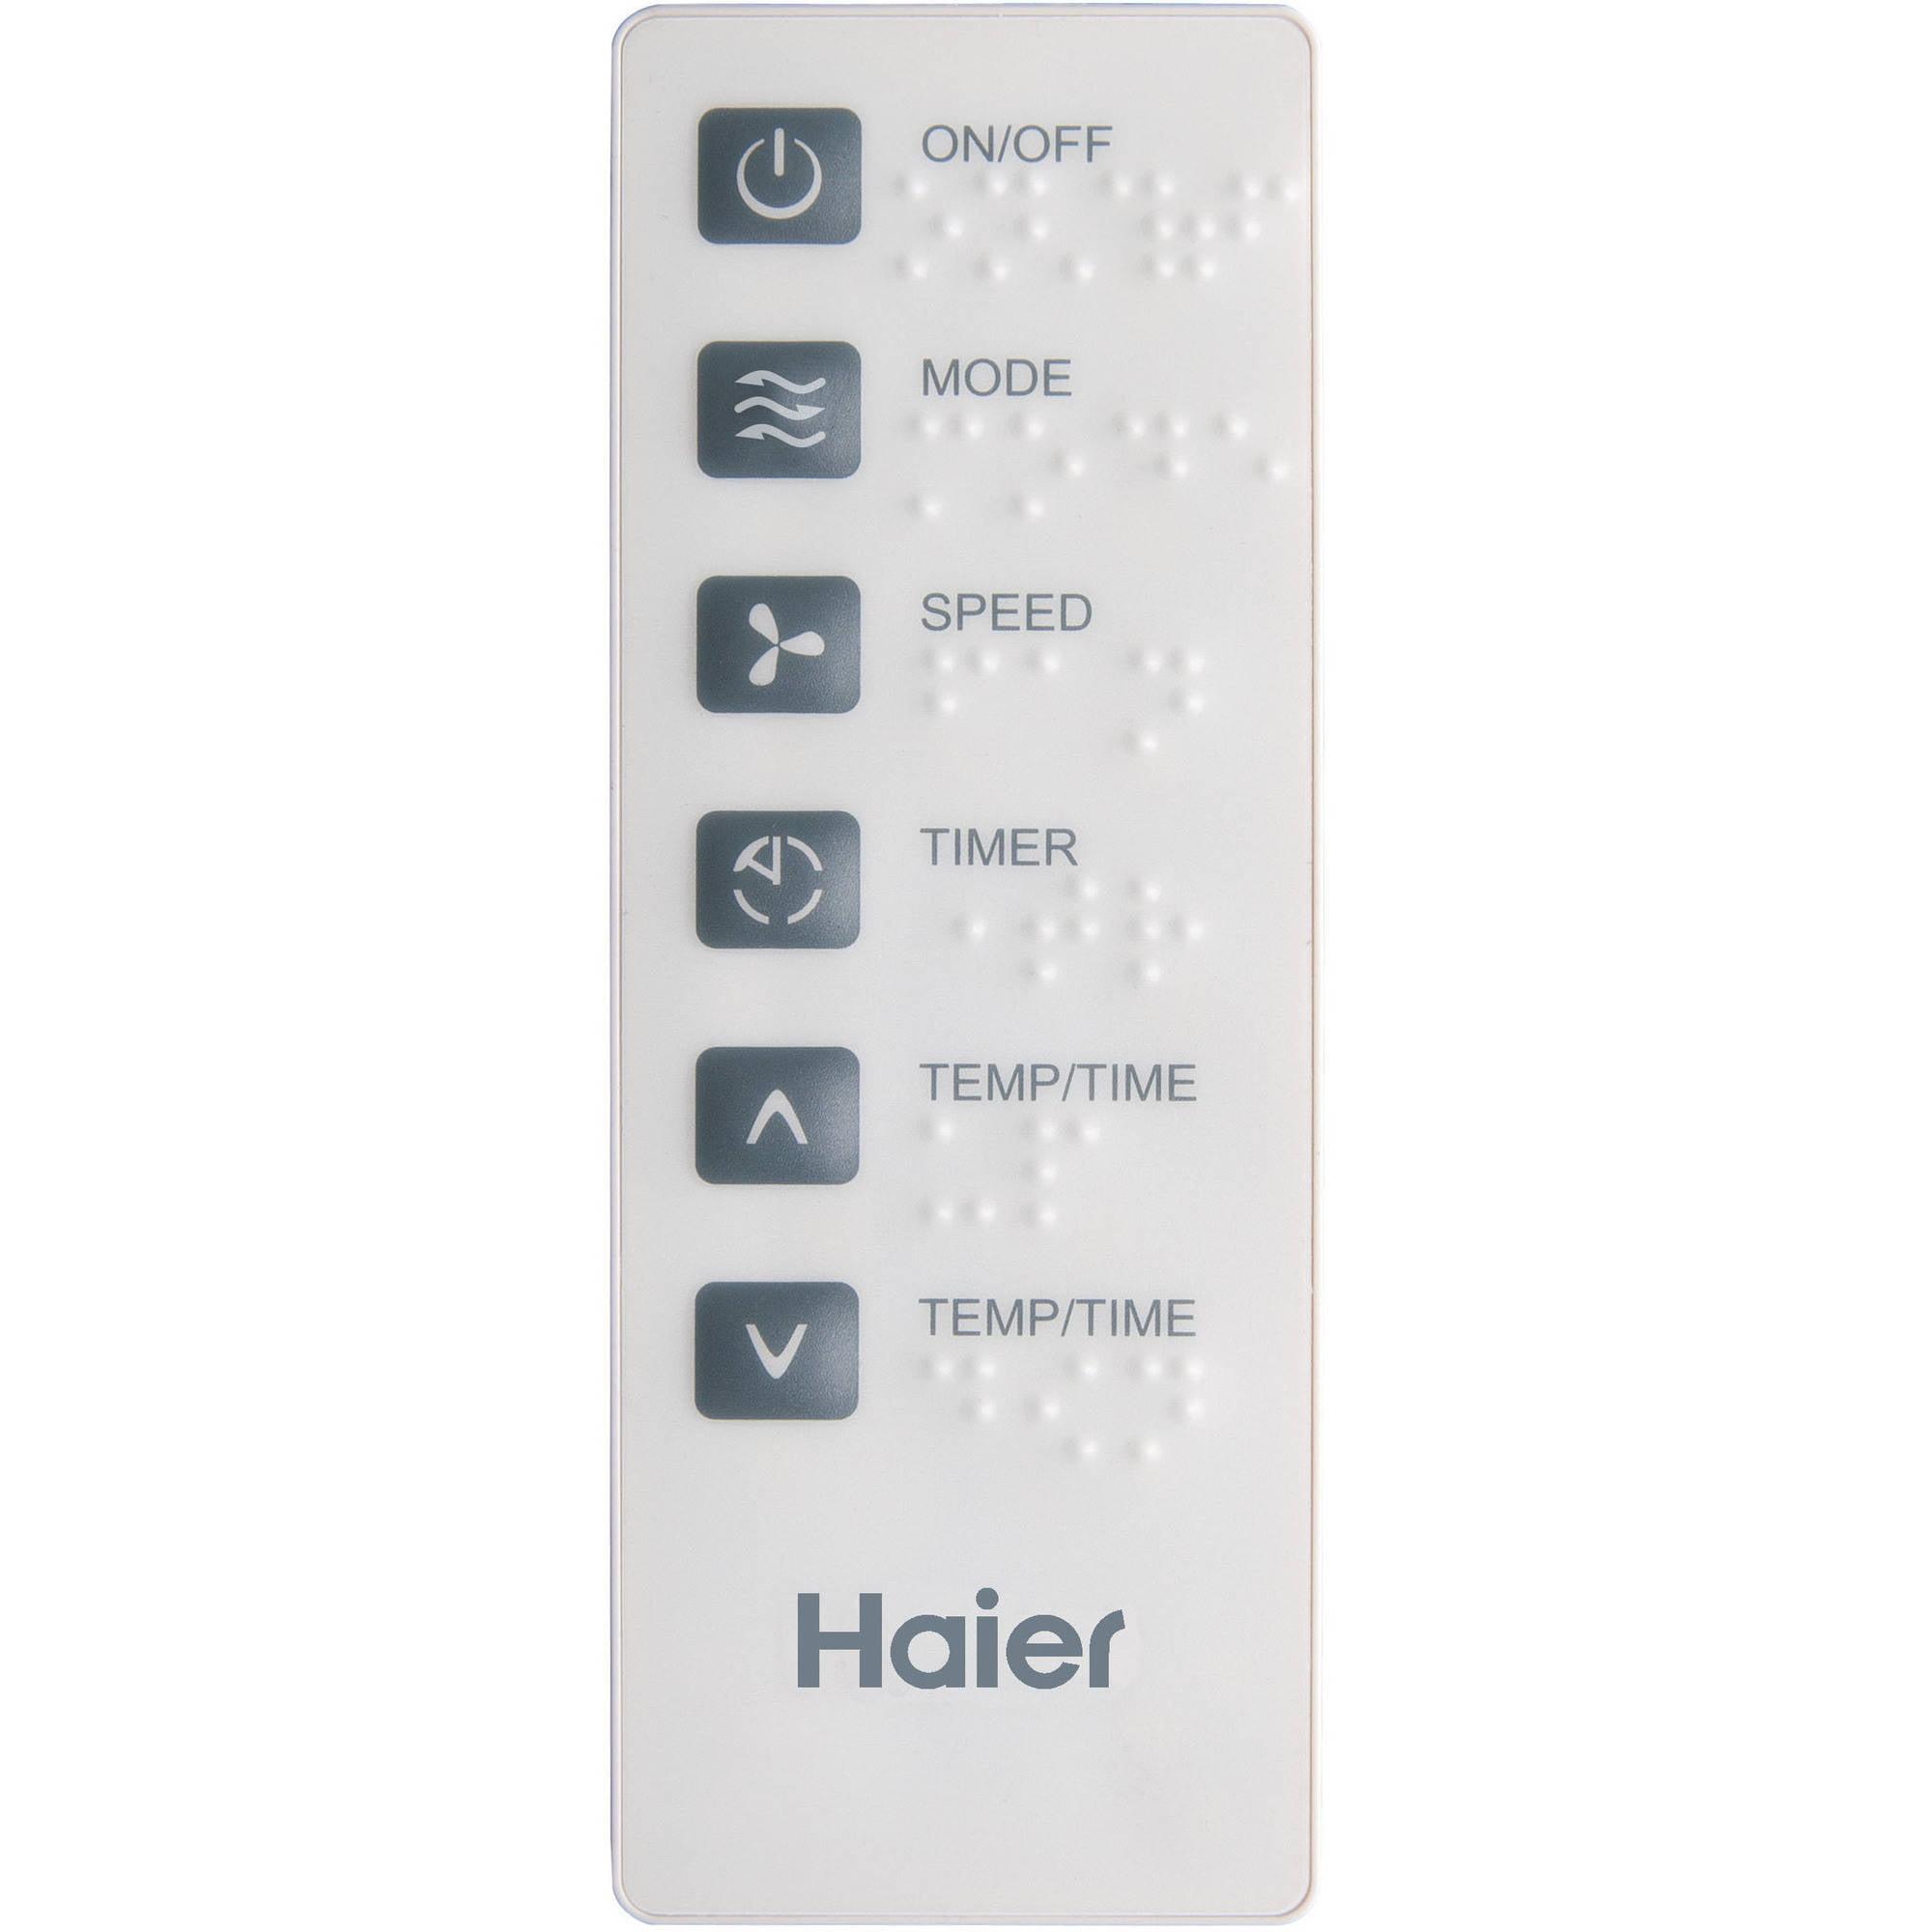 haier hwe08xcrld btu 112 ceer electronic control air conditioner walmartcom